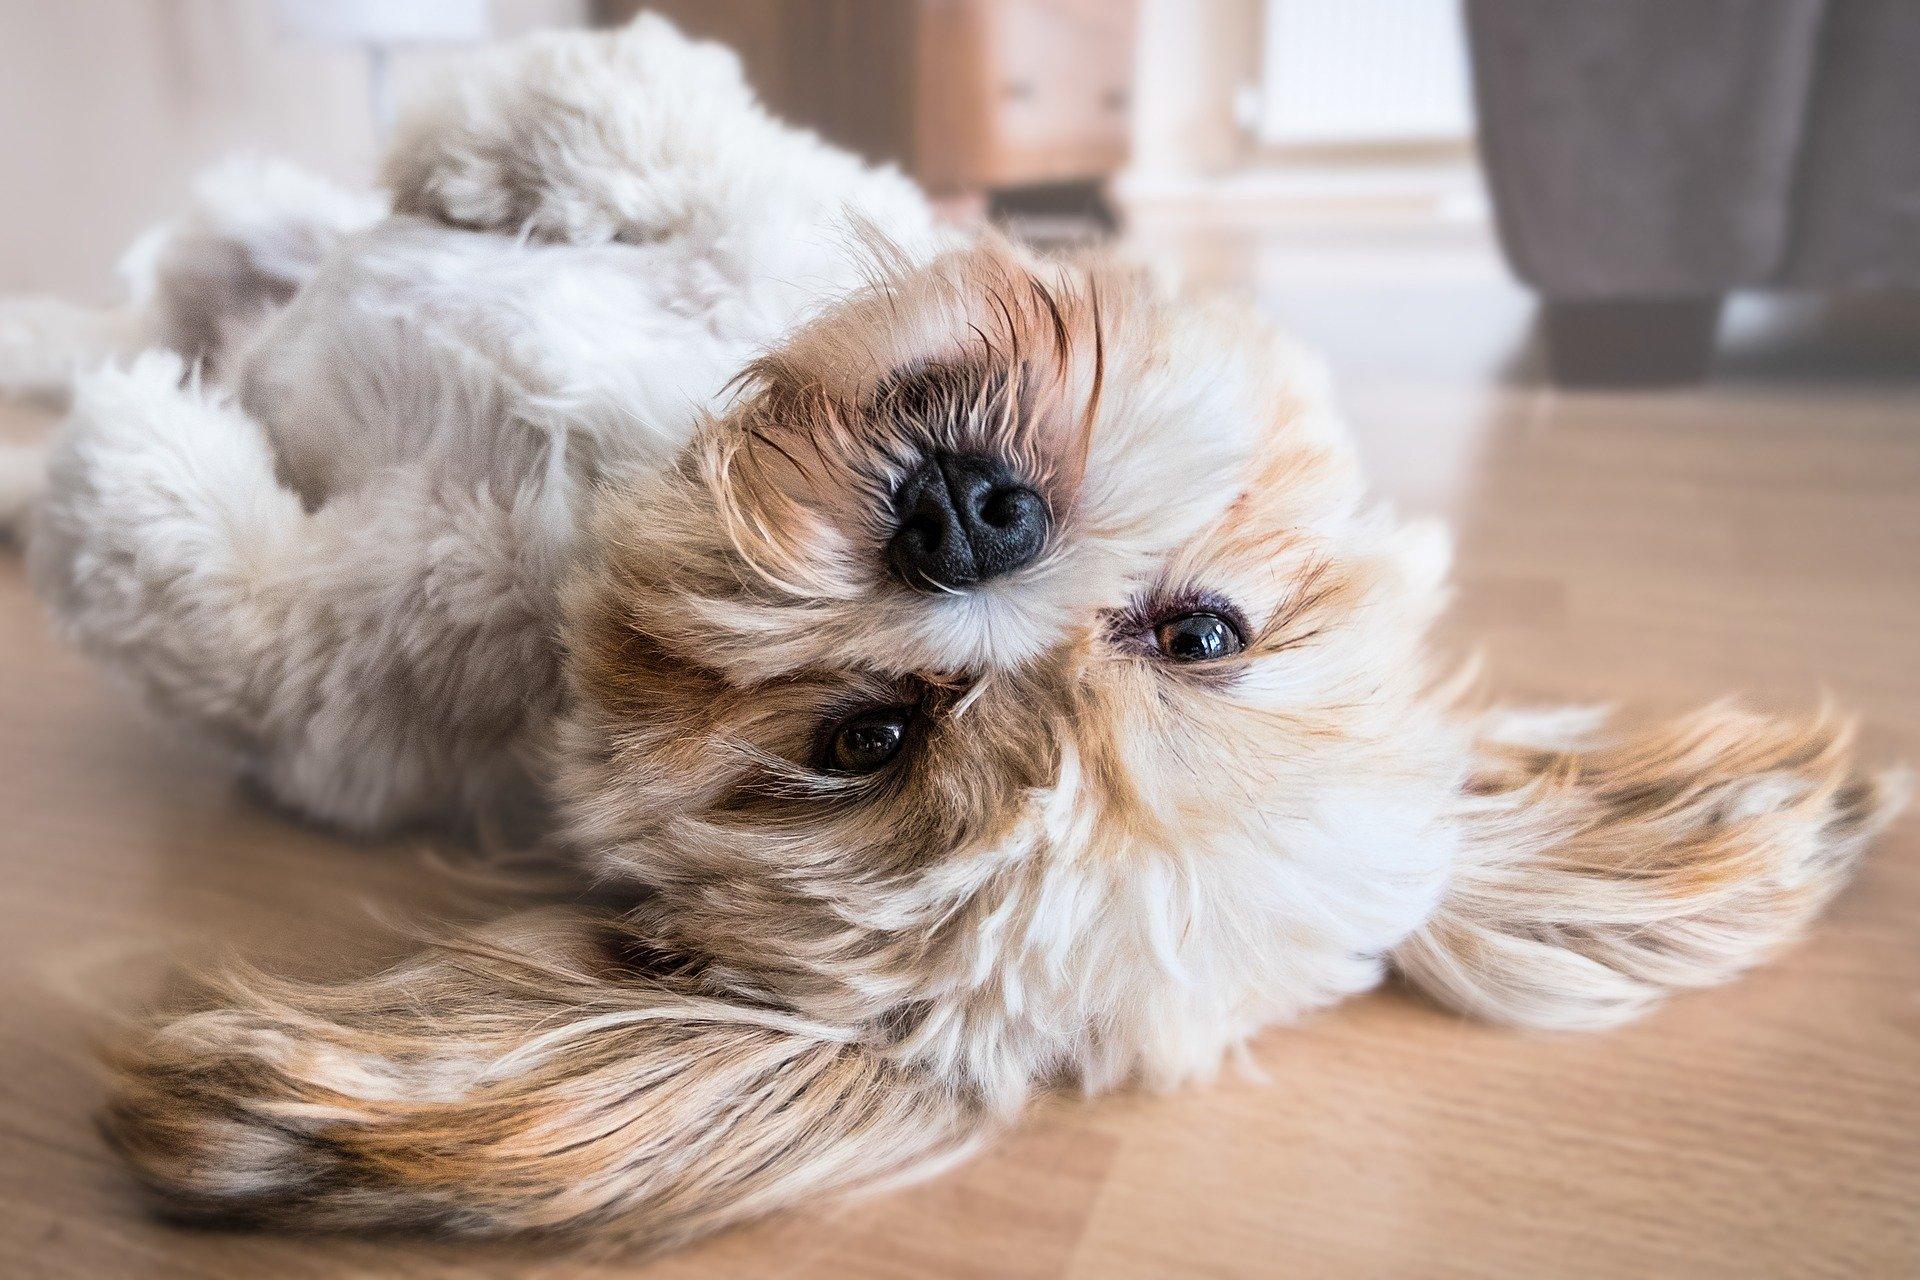 interdire un chien dans une location